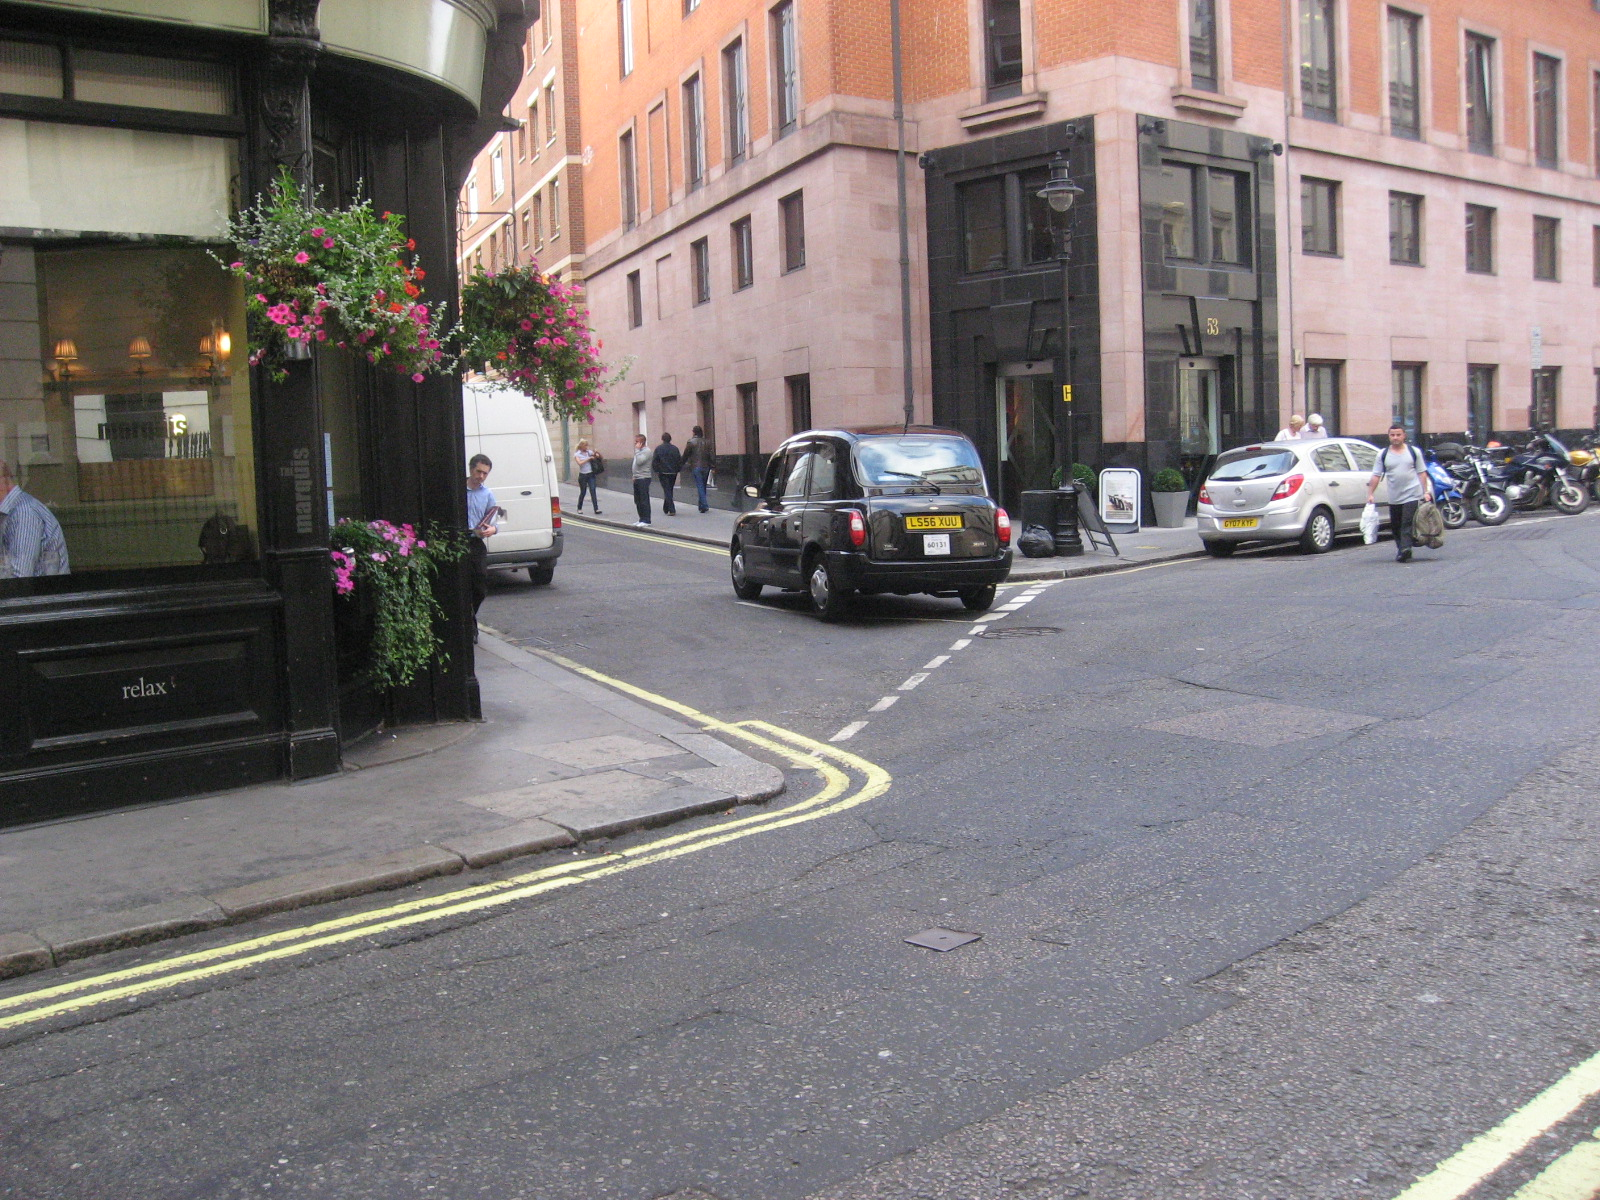 SIMPLIFY STREET CORNER DESIGN | PublicRealm.org